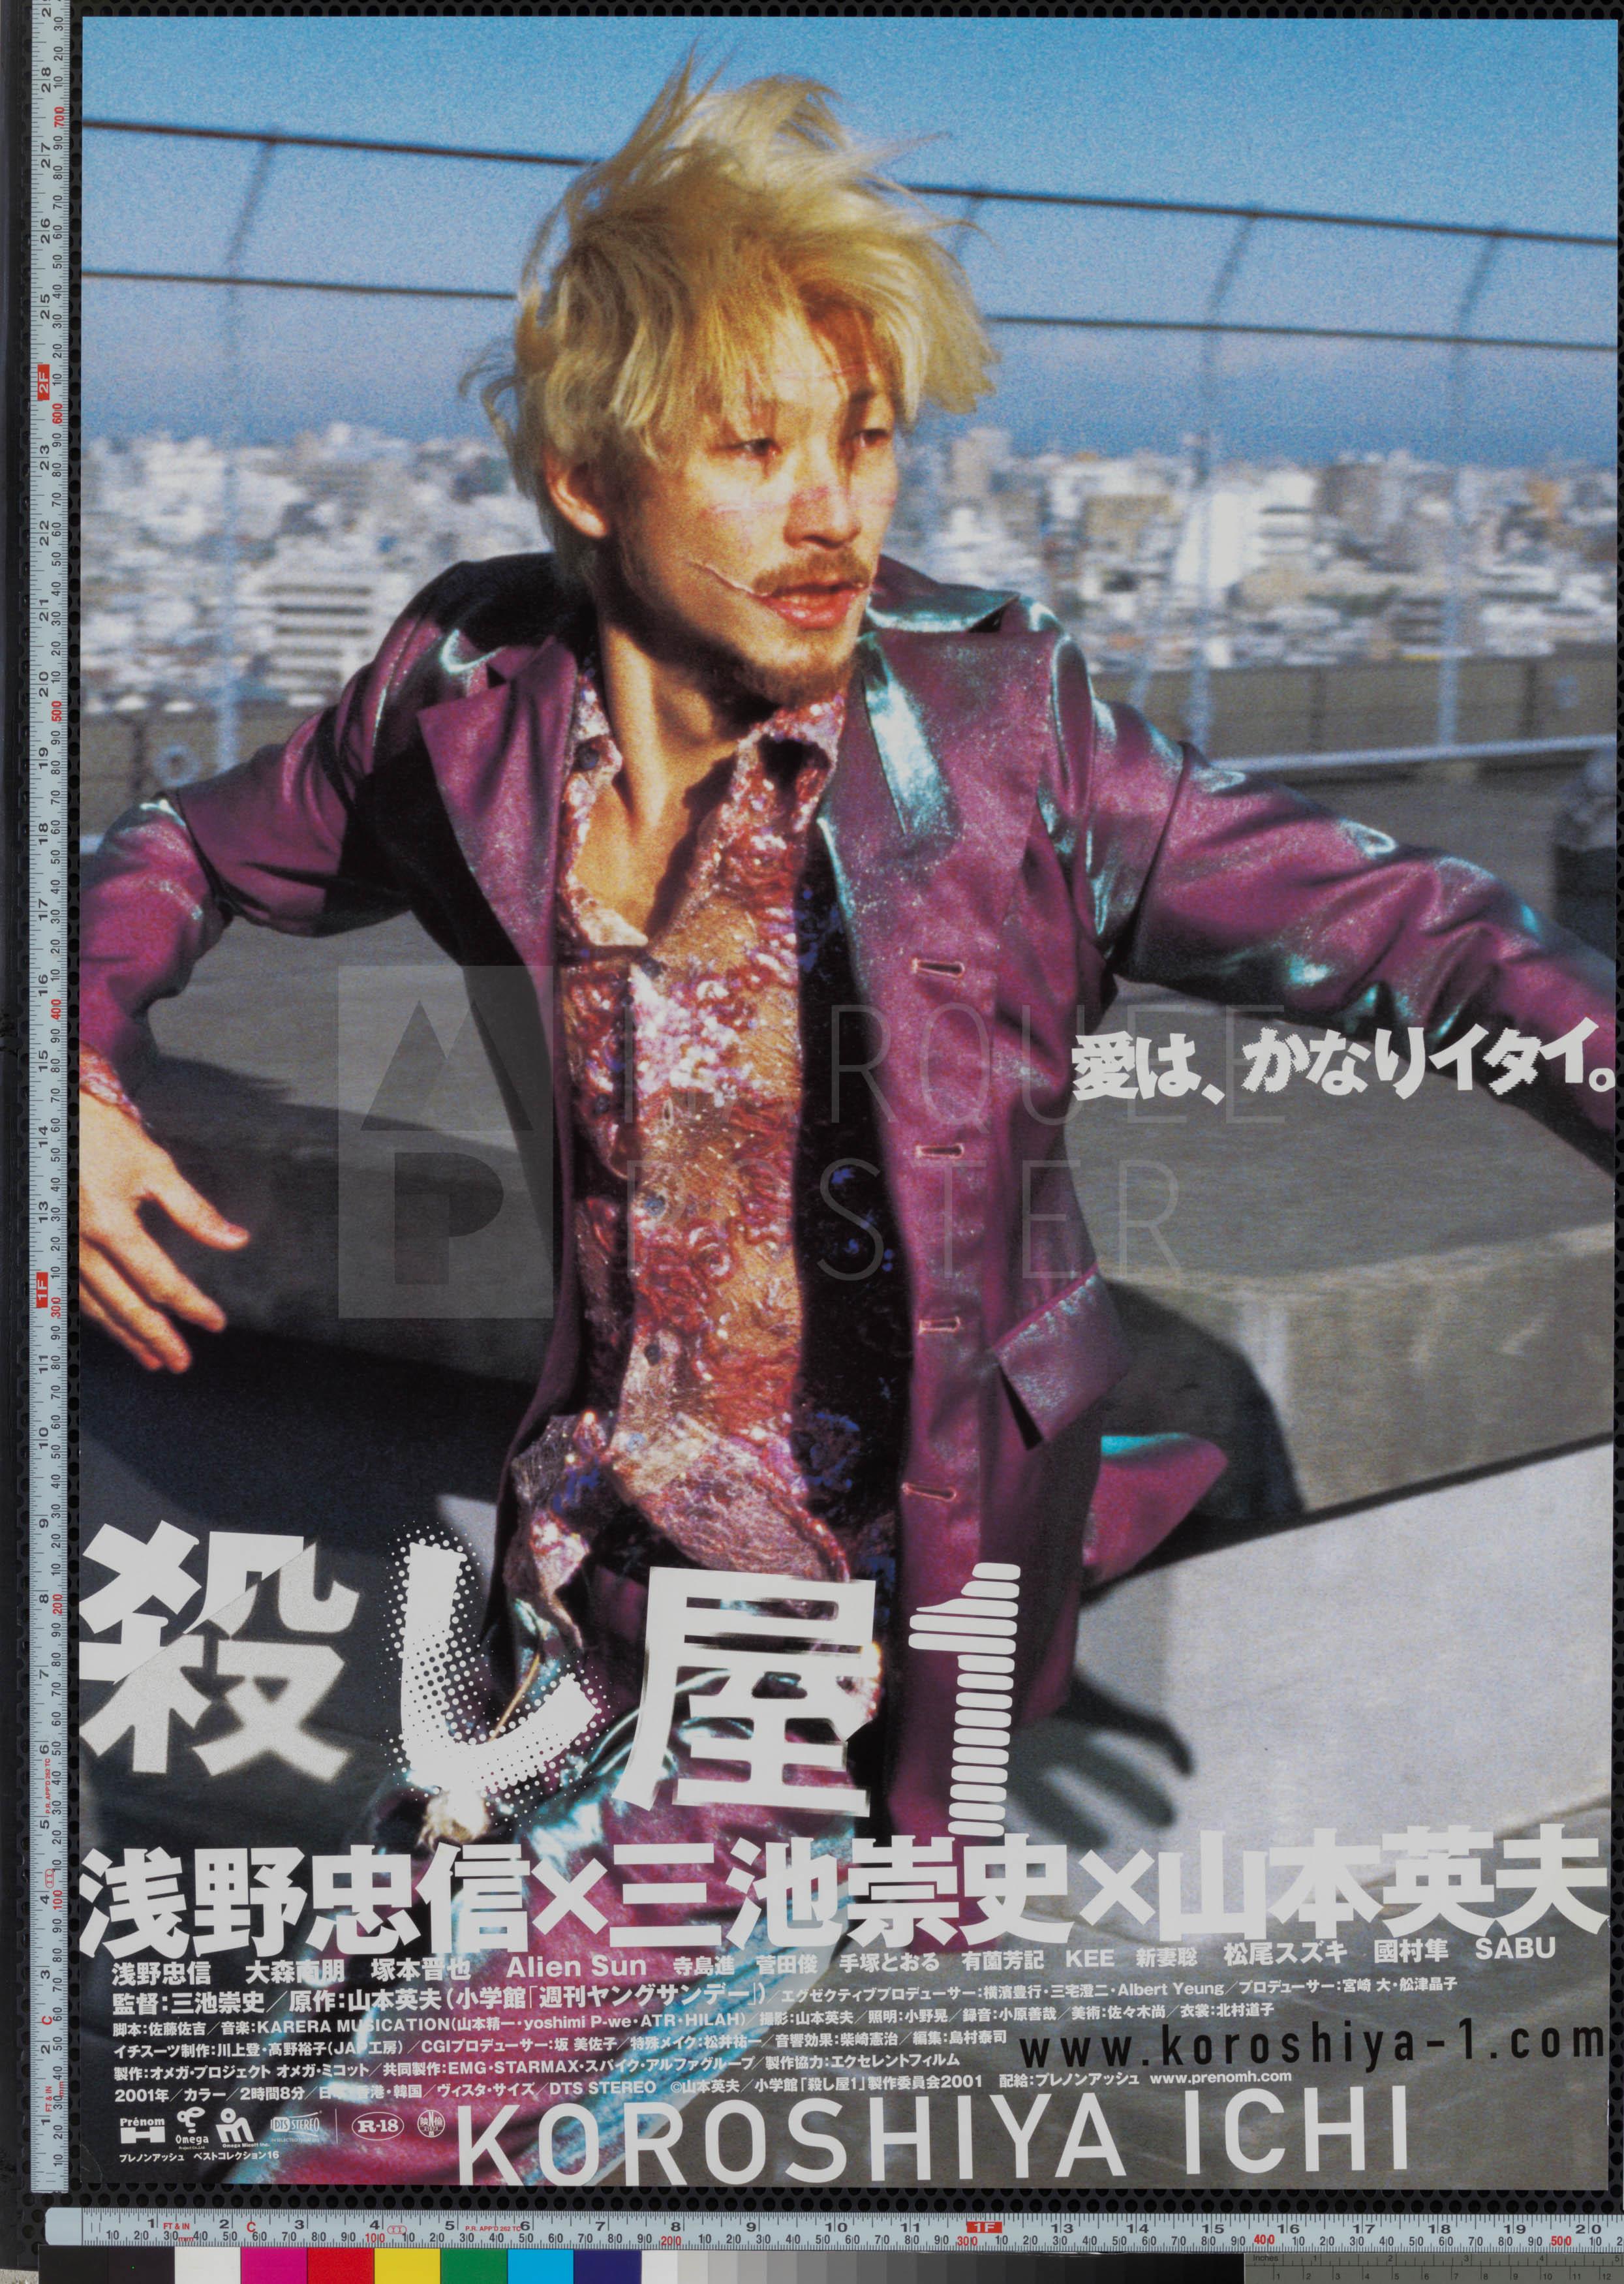 61-ichi-the-killer-standing-style-japanese-b2-2001-02